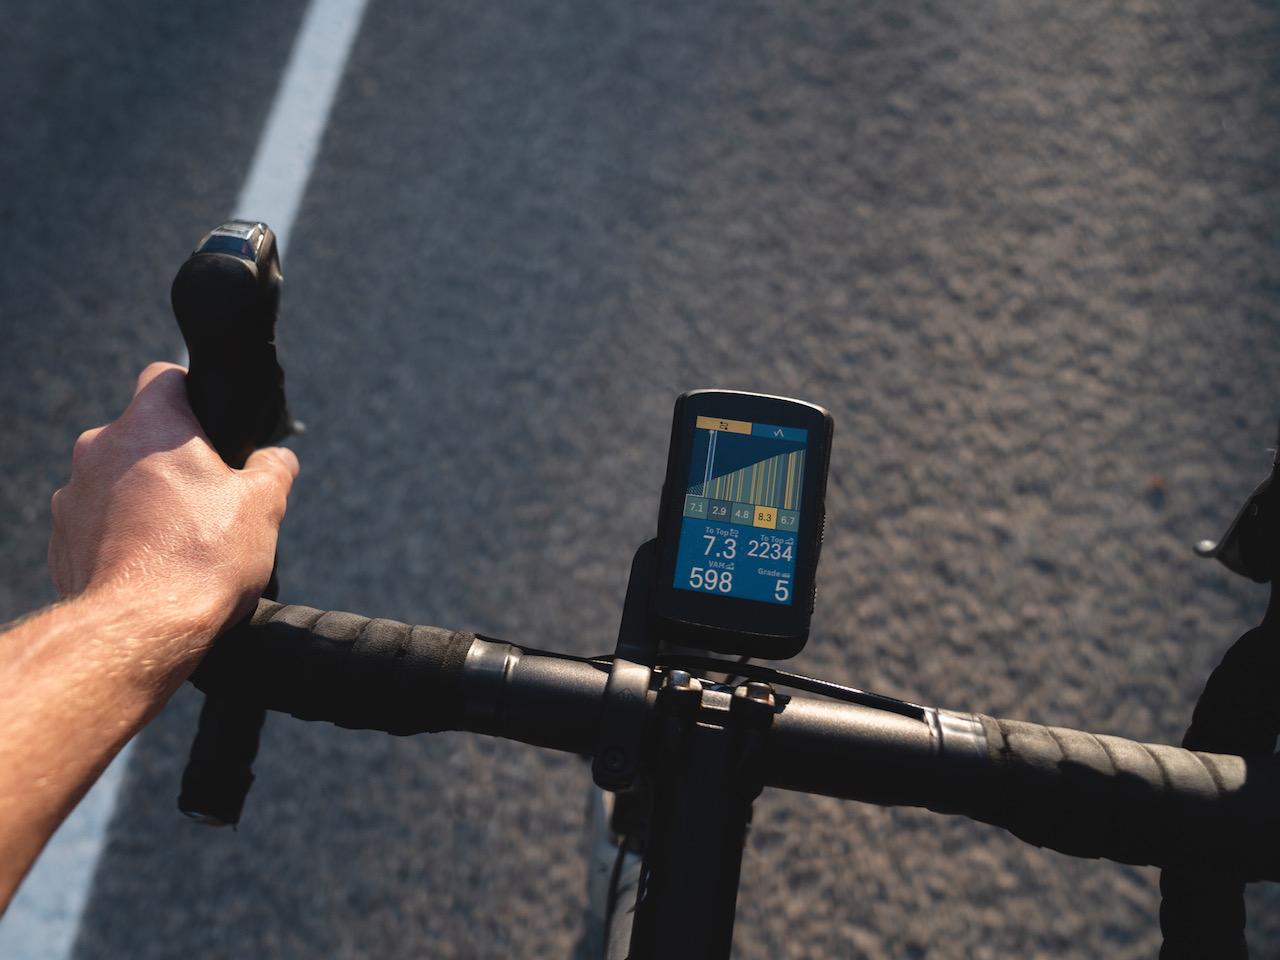 Hammerhead CLIMBER on bike